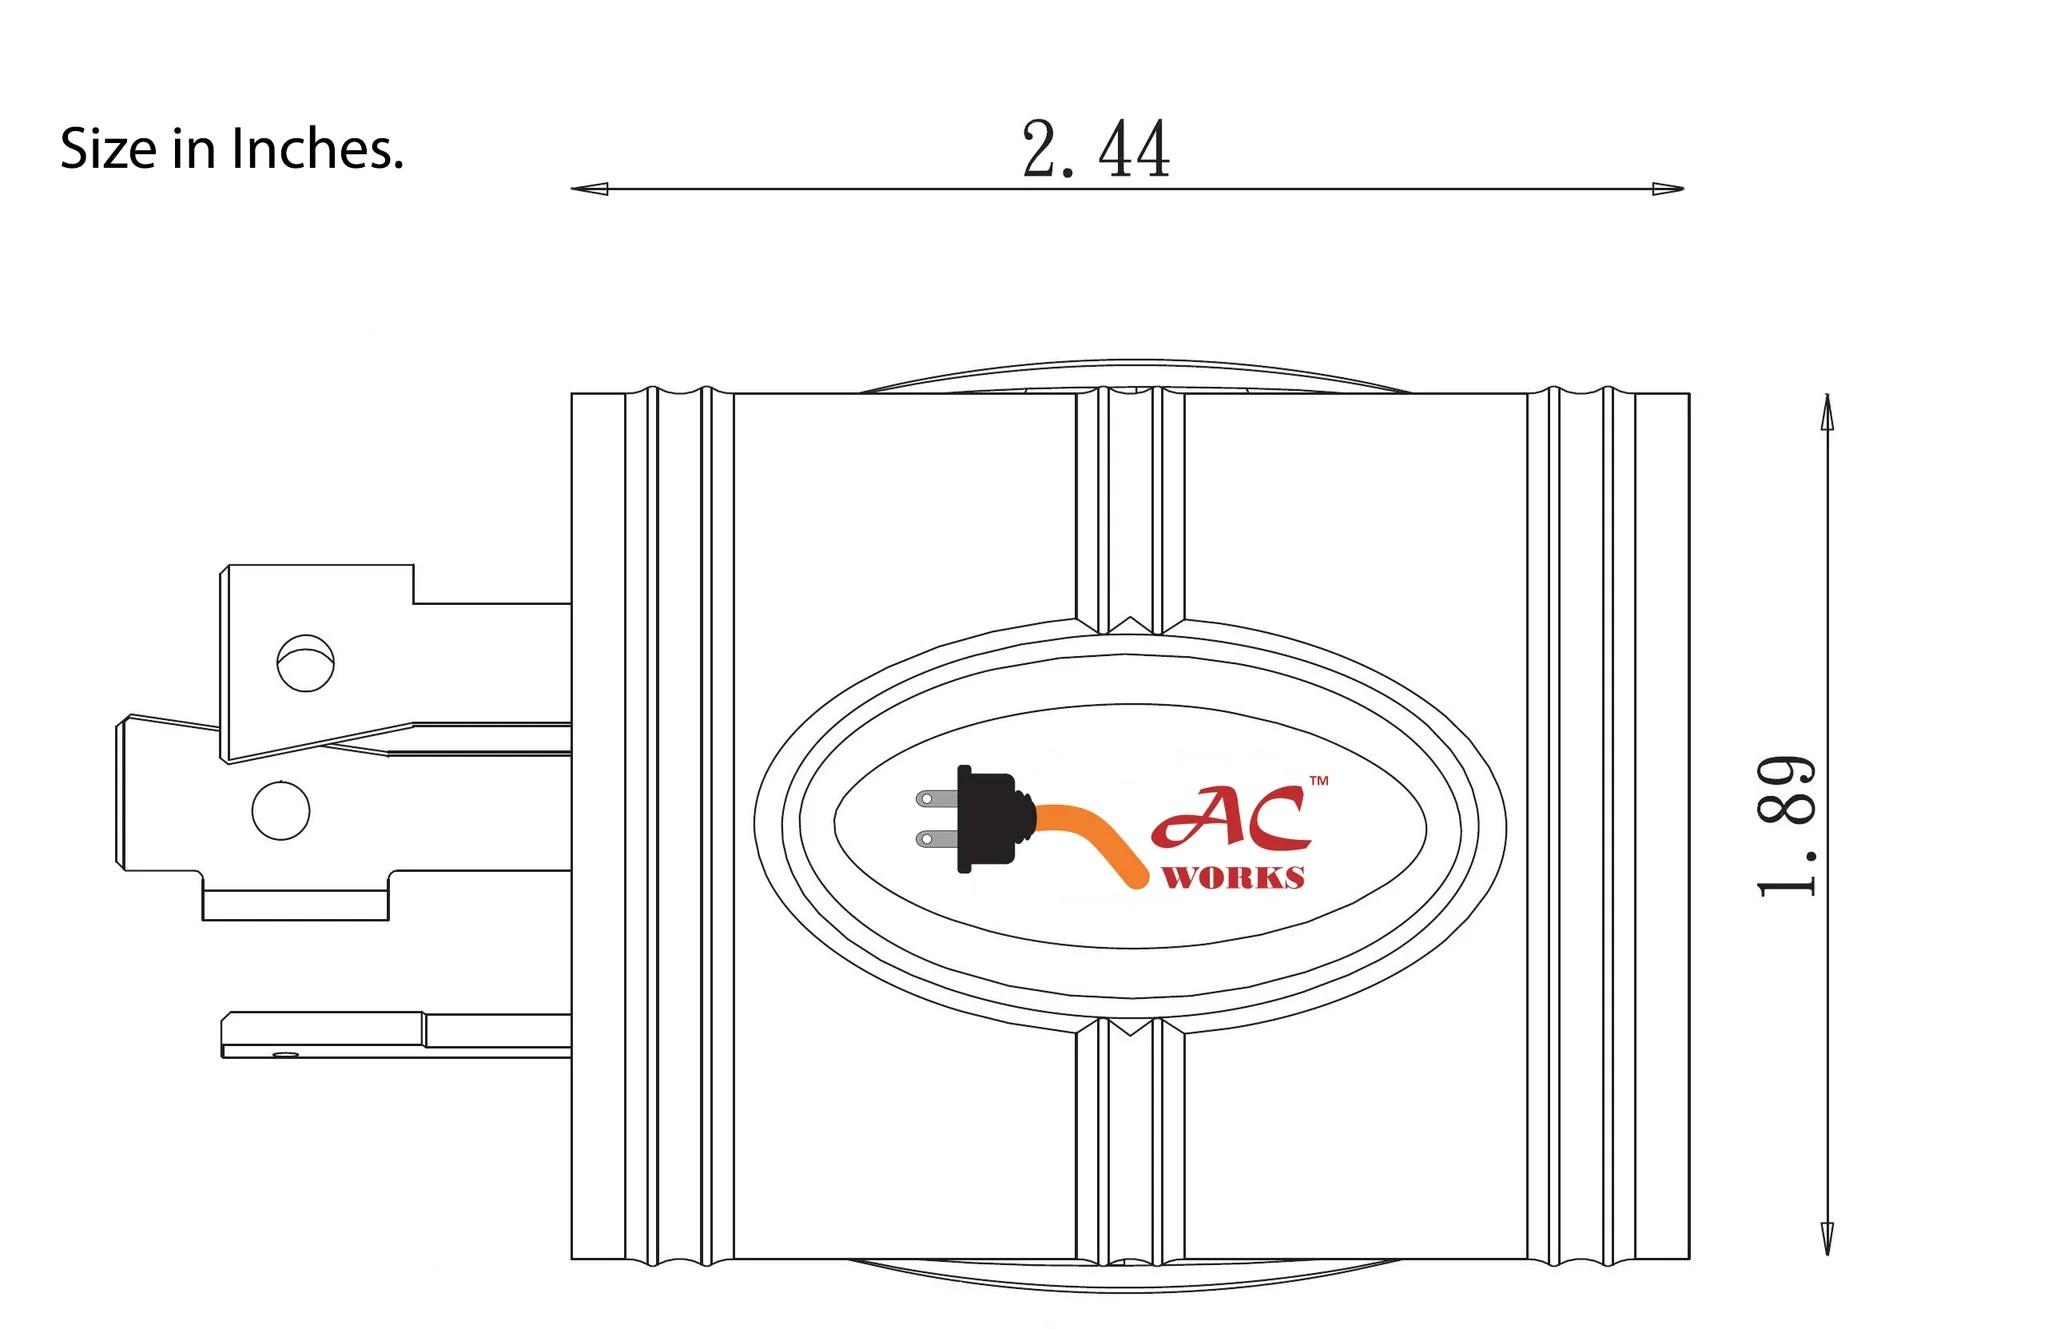 small resolution of  ac connectors ac works adl530l520 3 prong locking plug nema l5